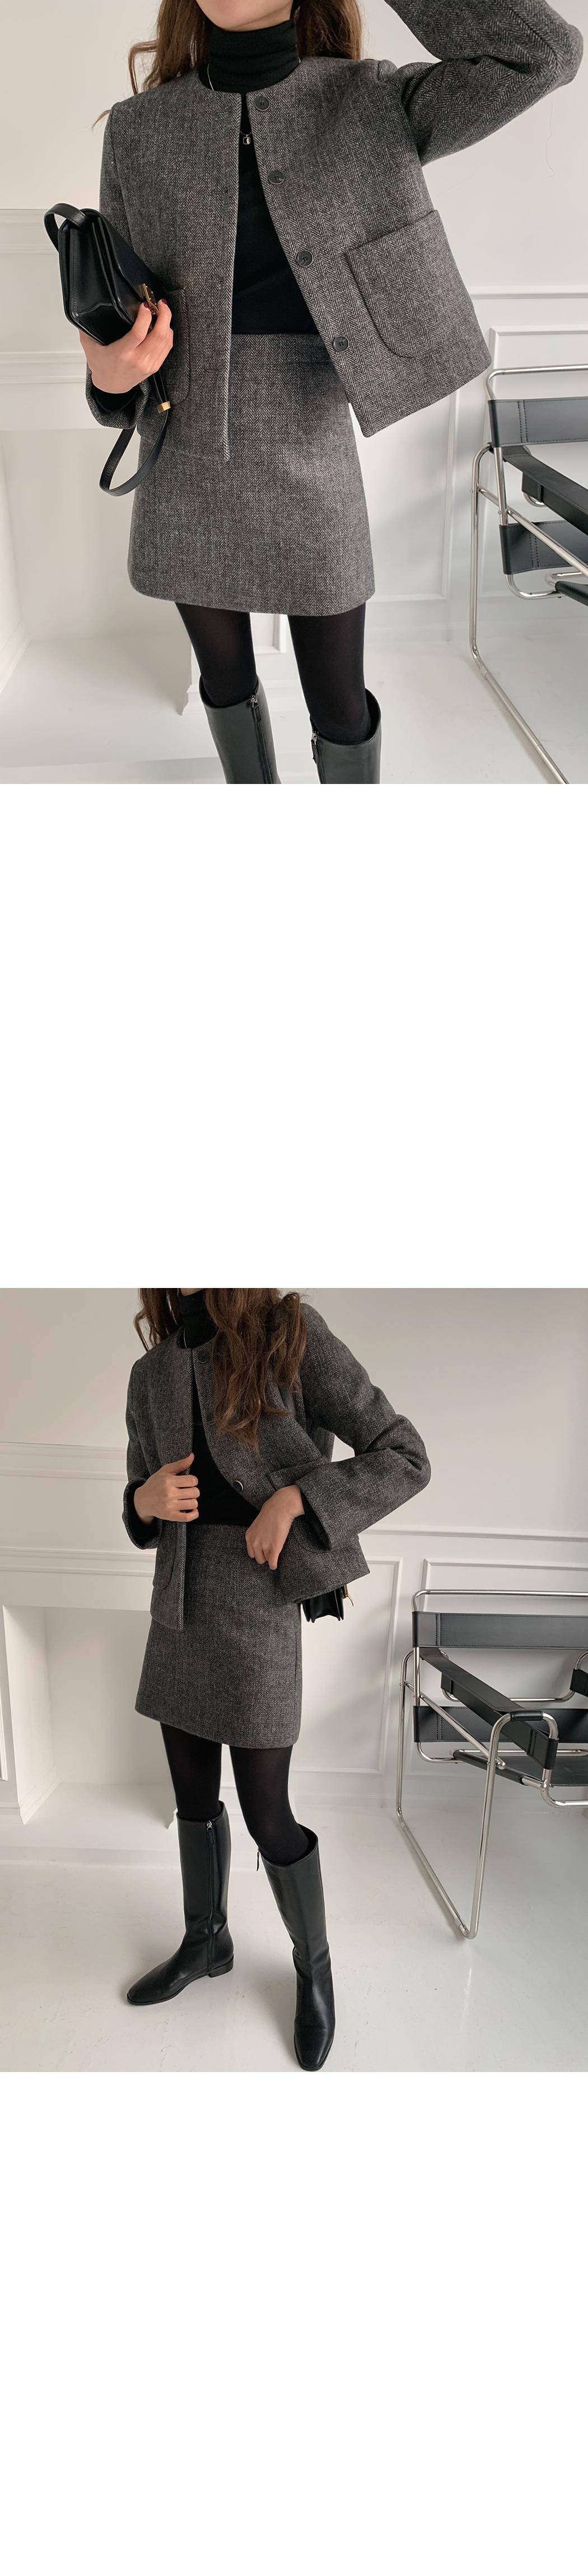 Herringbone no-collar wool jacket